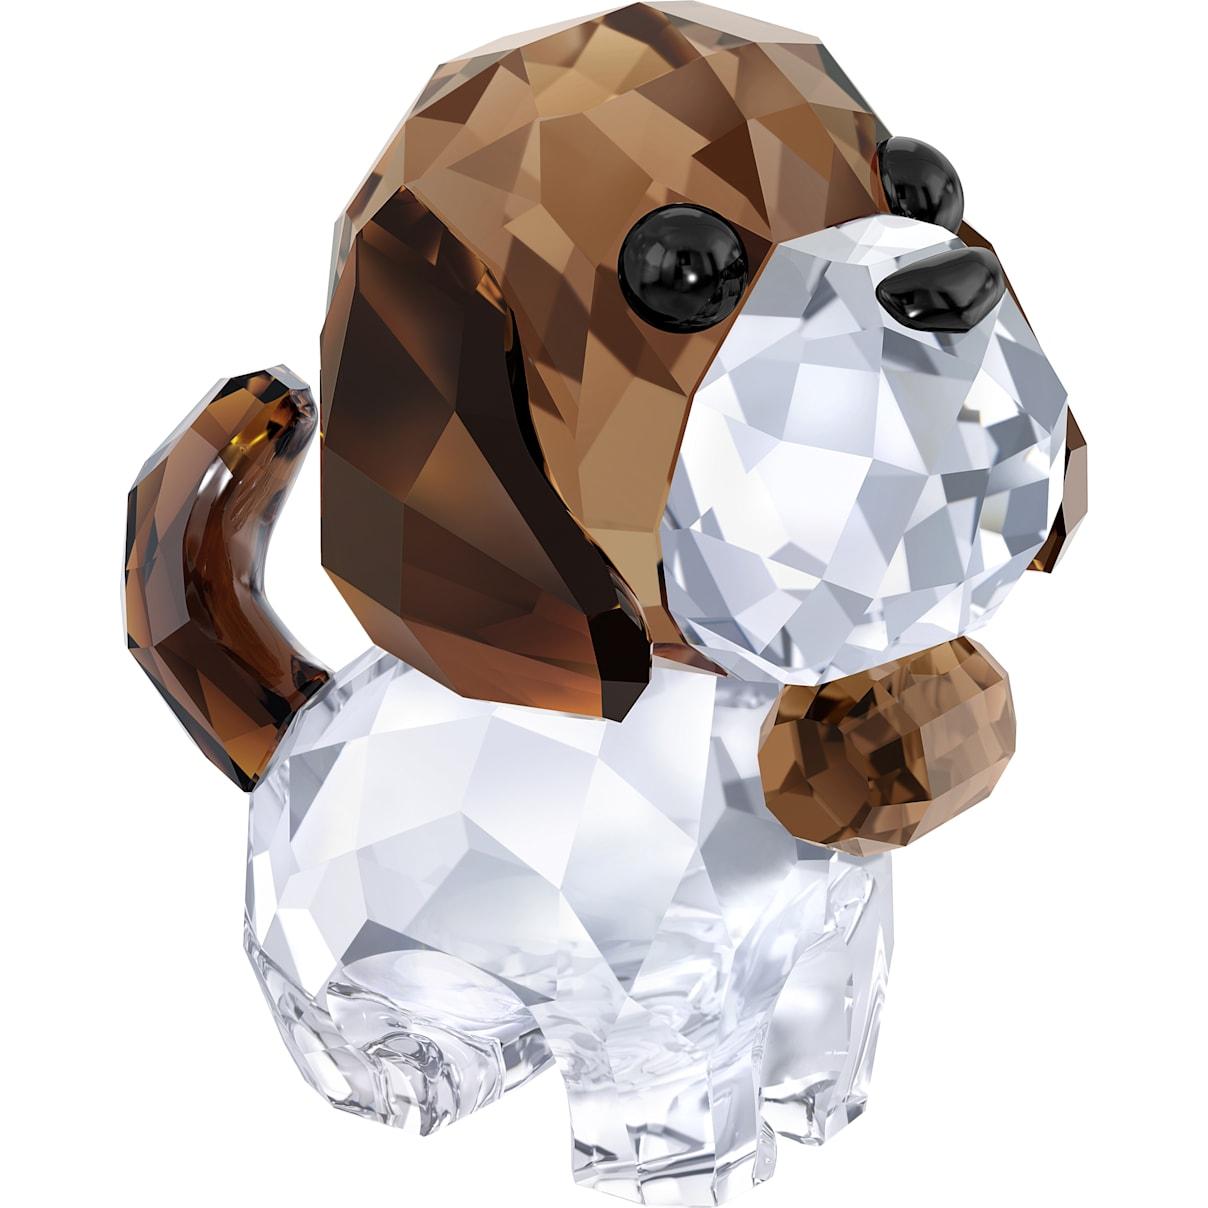 Swarovski Puppy - Bernie the Saint Bernard